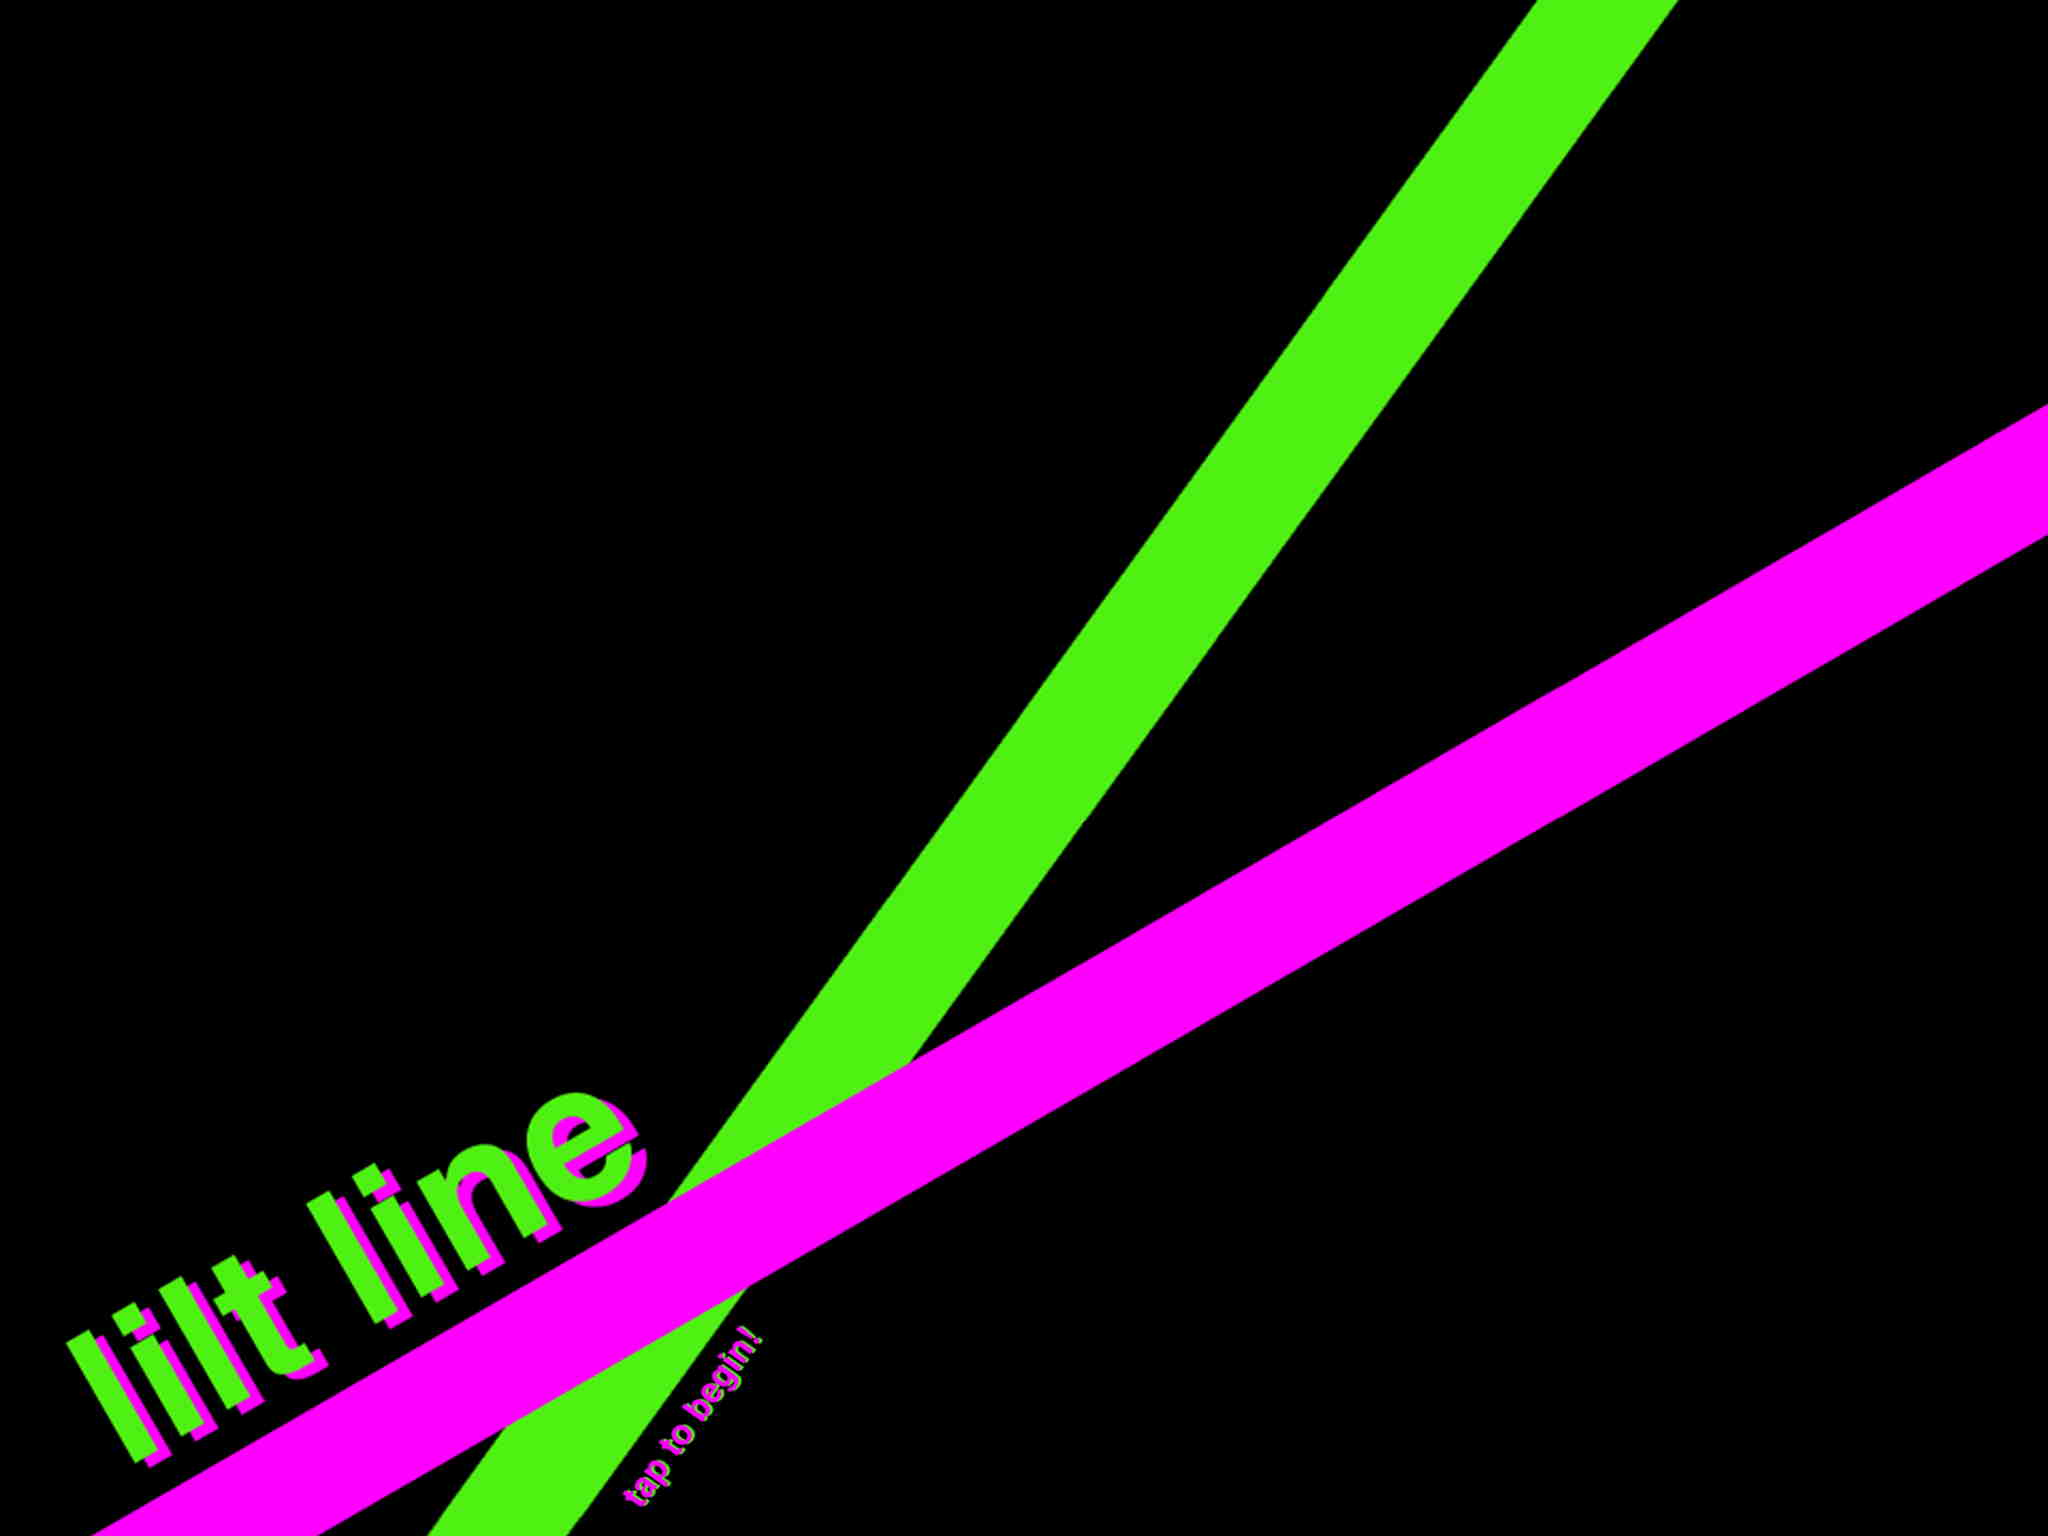 LiltLine_01